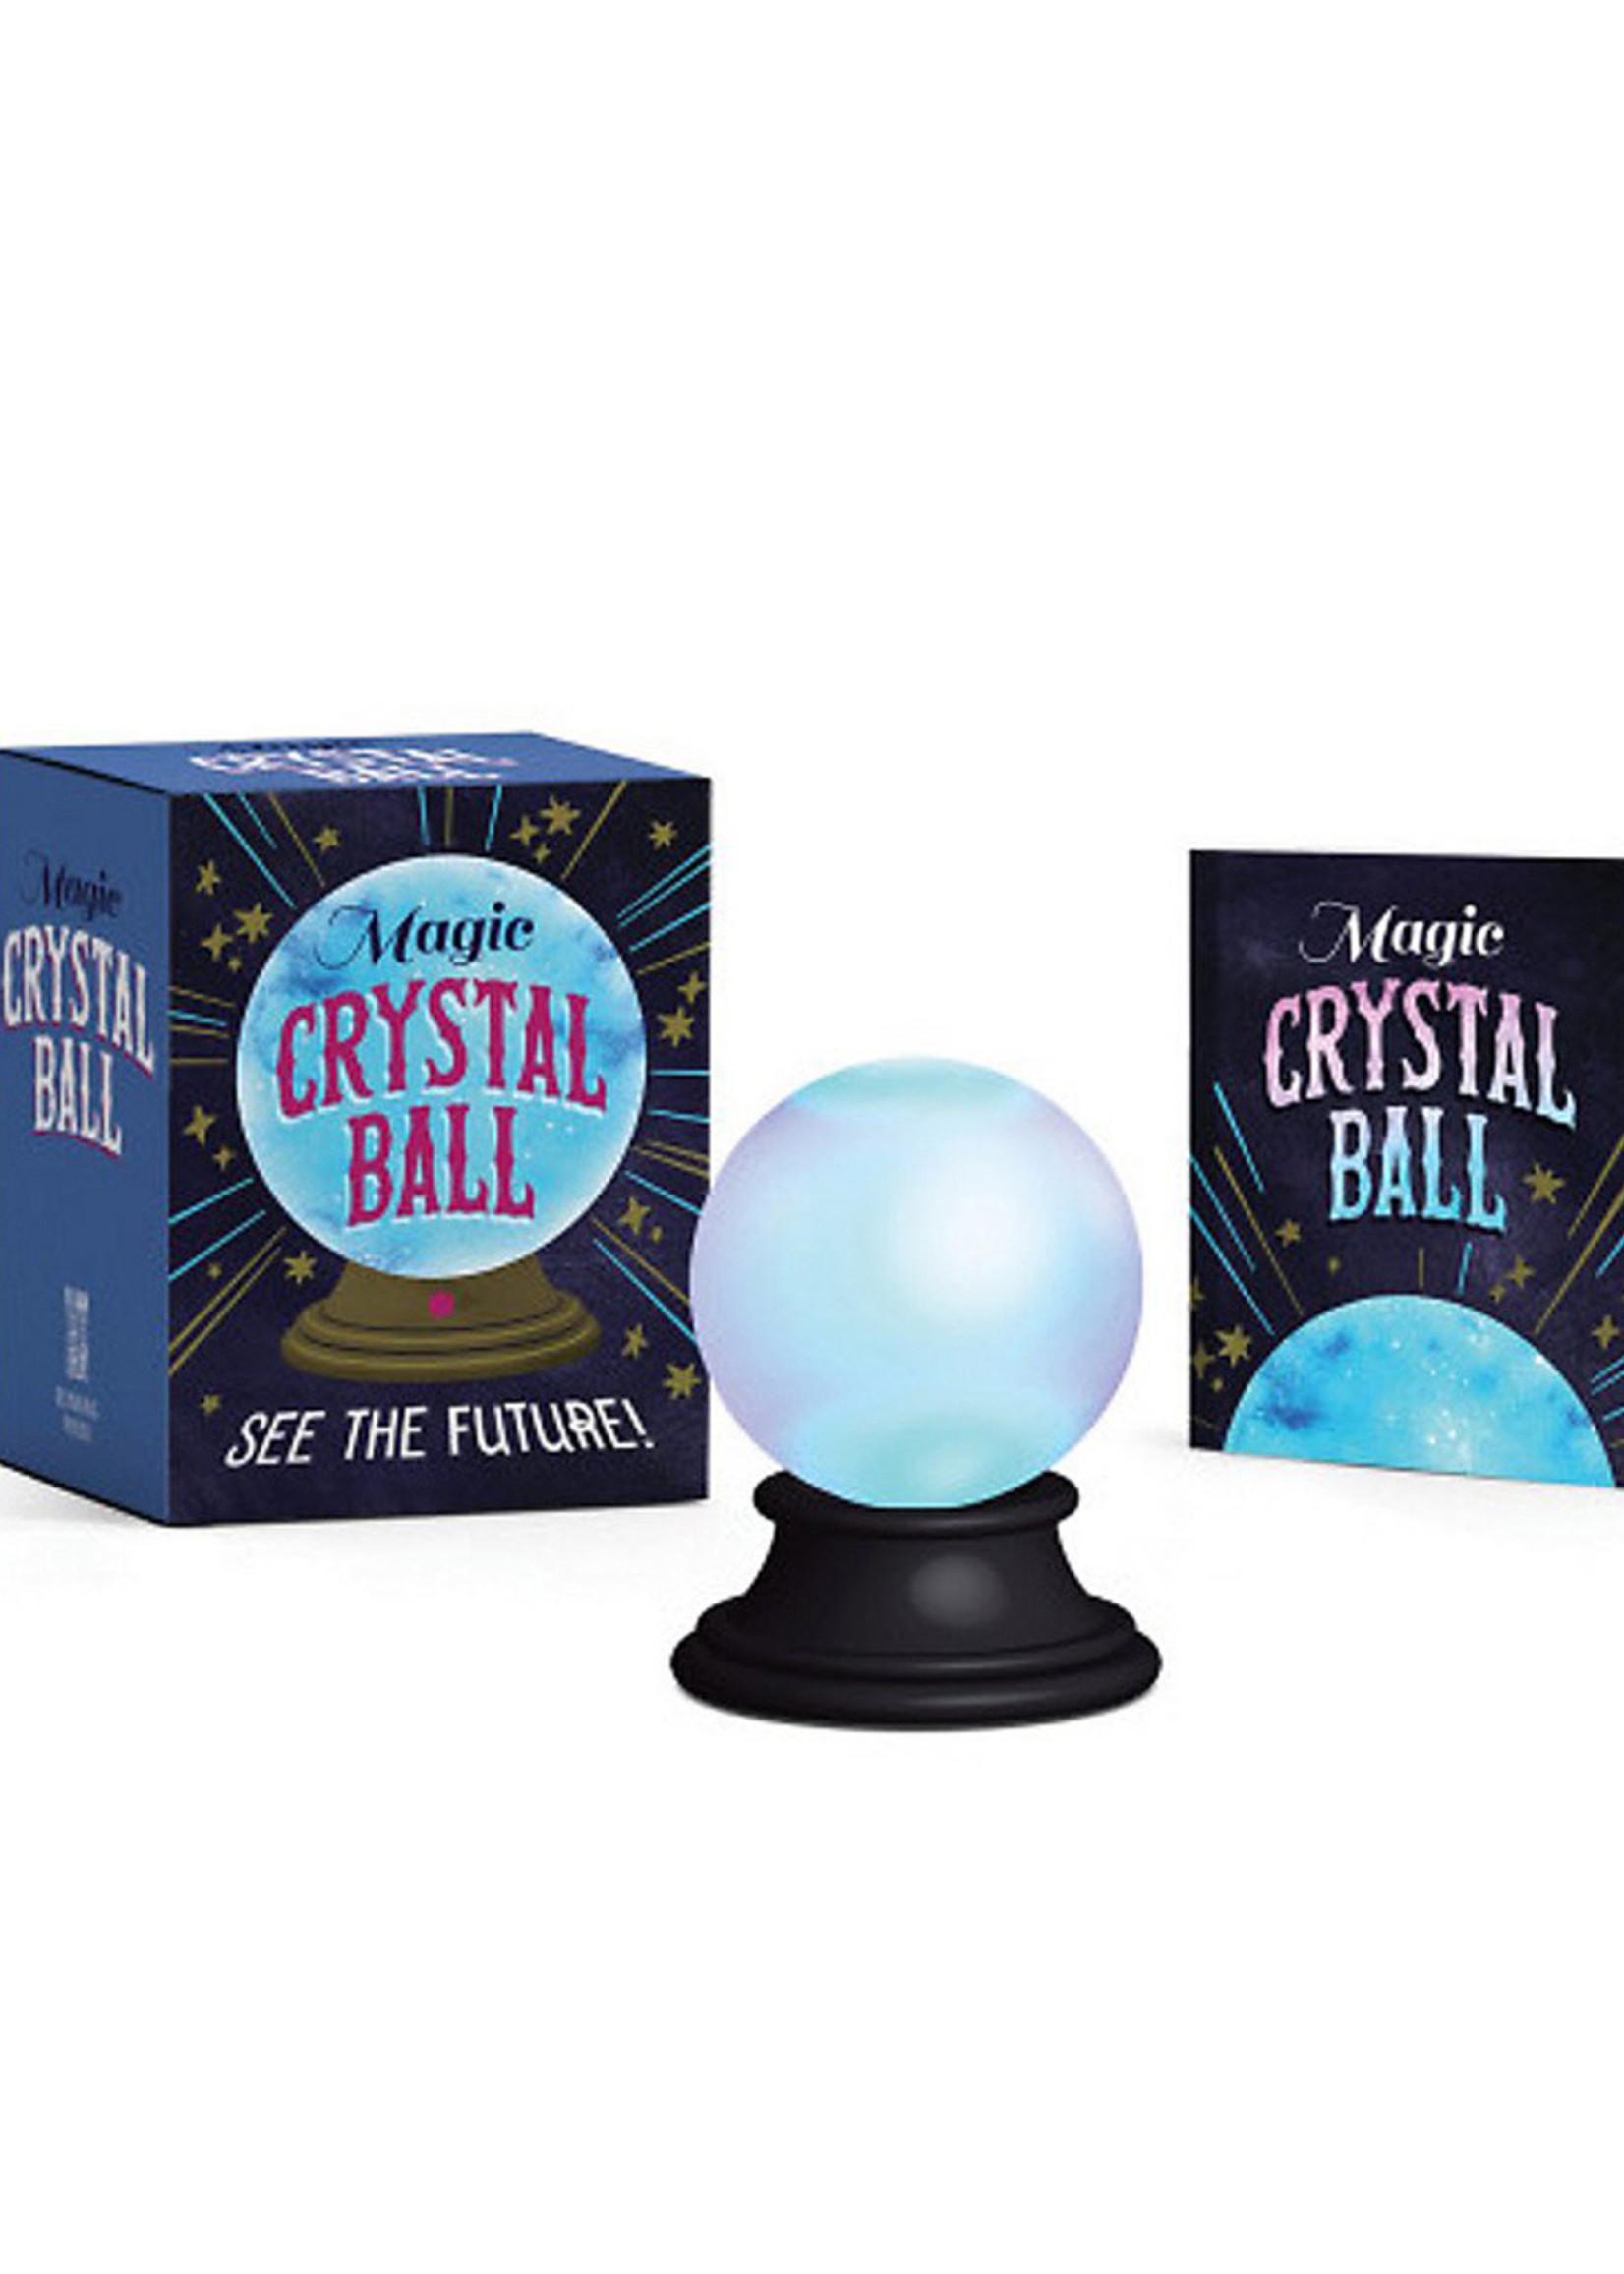 Magic Crystal Ball, See the Future! - Box